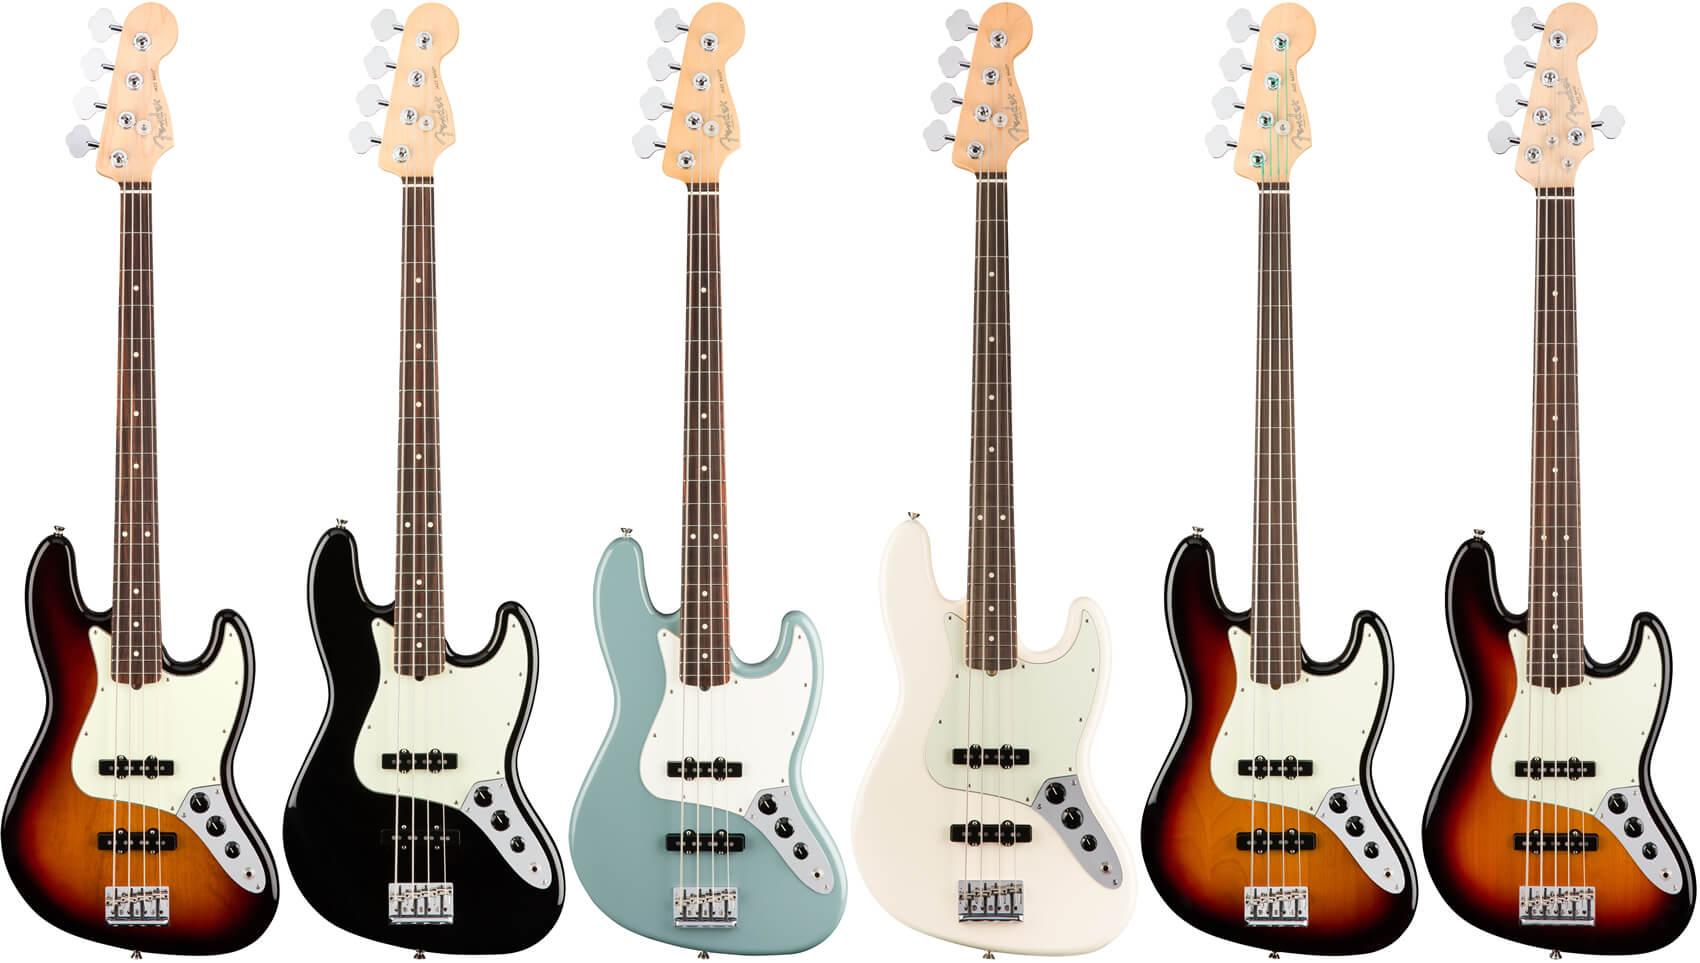 American Professional Jazz Bass